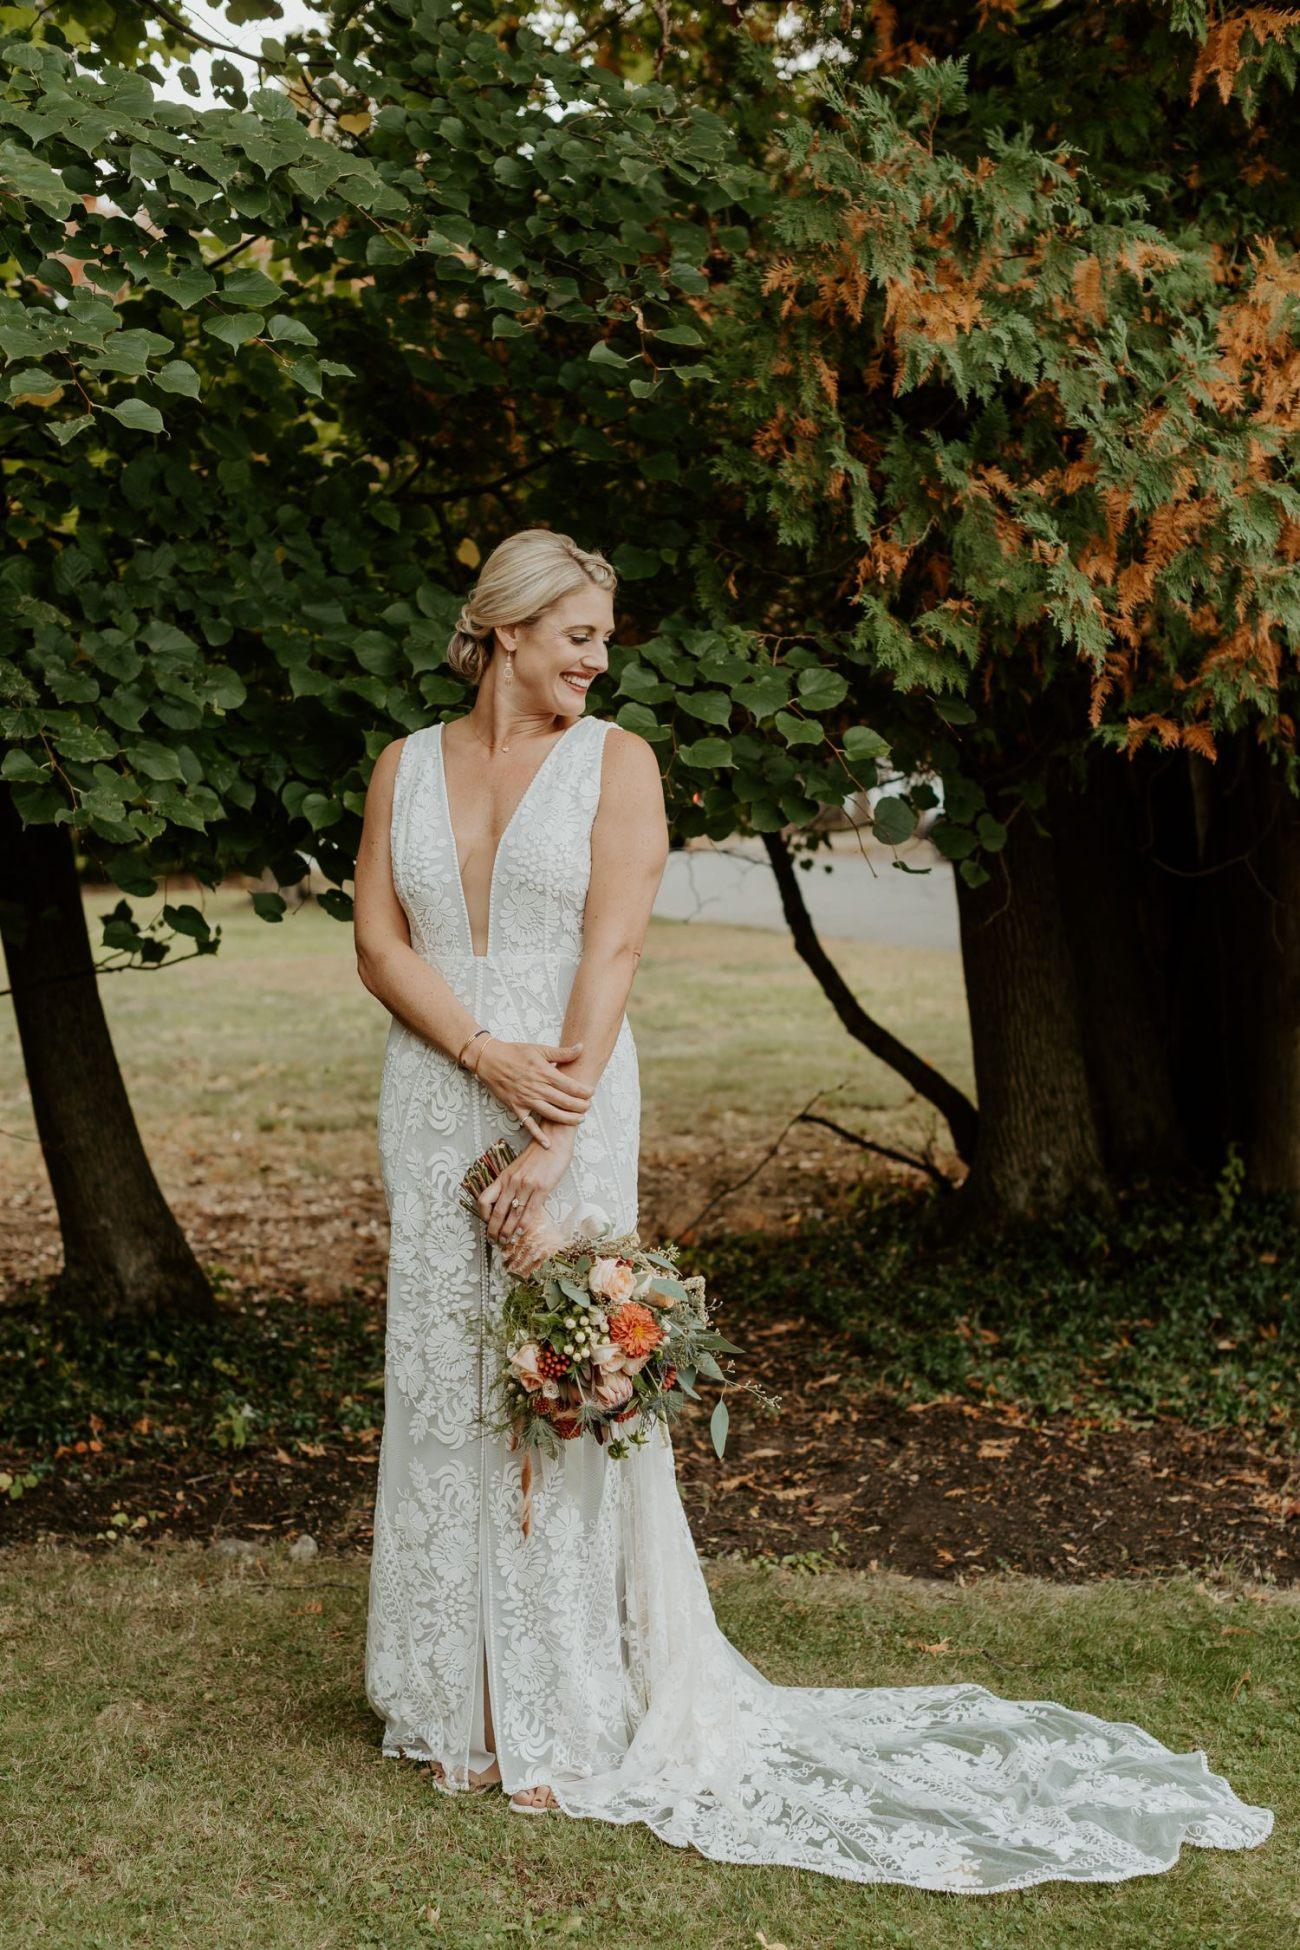 New Jersey Fall Backyard Wedding Bend Wedding Photographer NJ Wedding Photographer Anais Possamai Photography 026